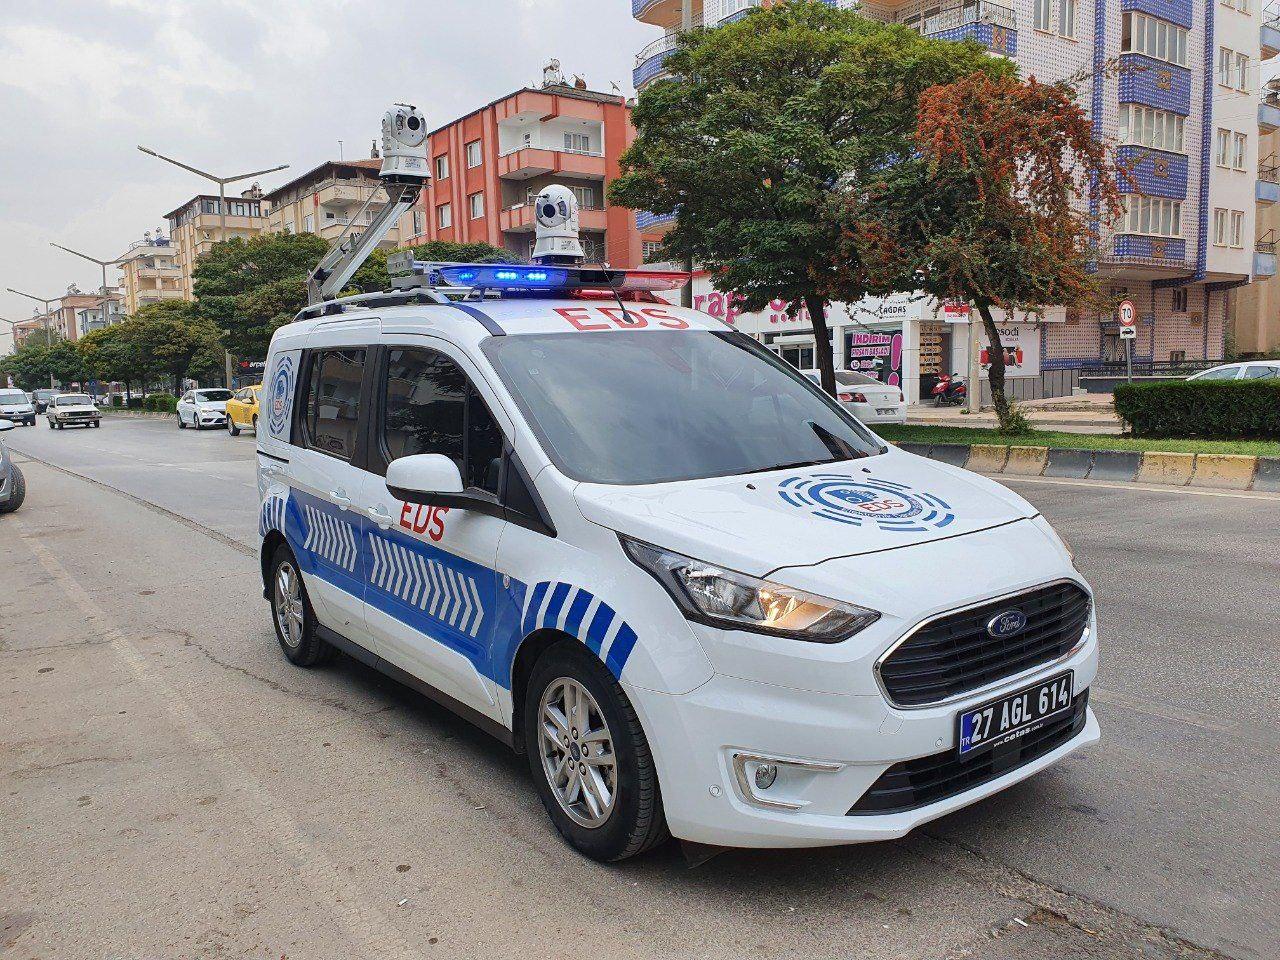 Mobil İhlal Tespit Sistemi (MİTS) Sokaklarda…